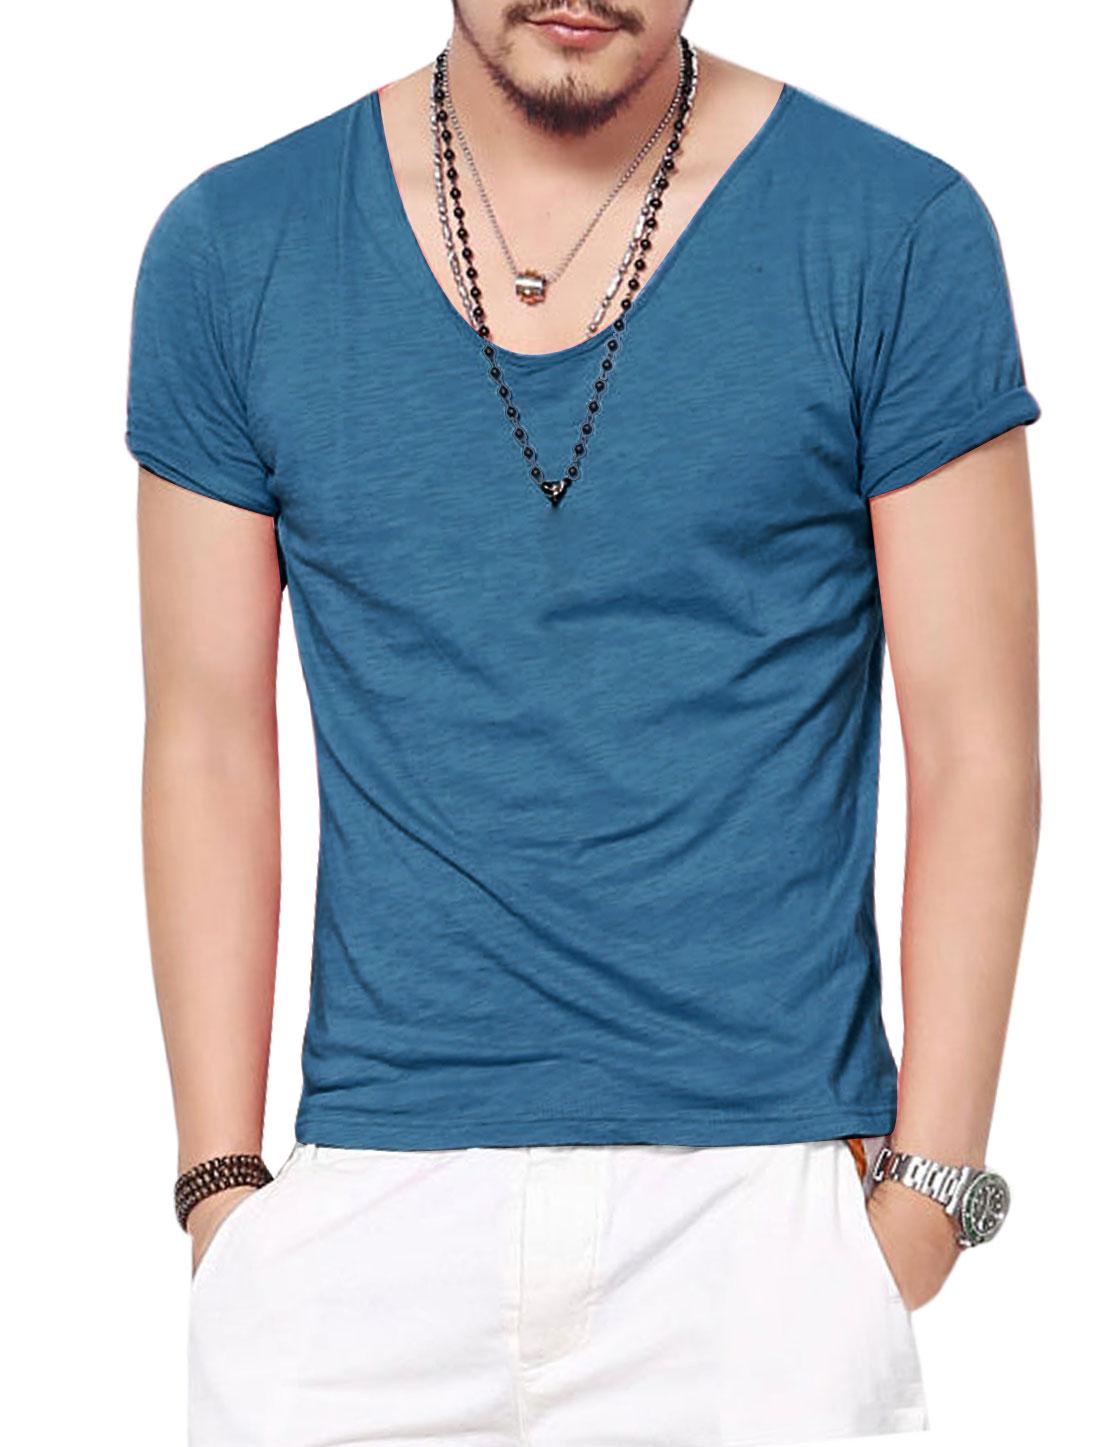 Man Navy Blue M Scoop Neck Pullover Summer Fit T-Shirt